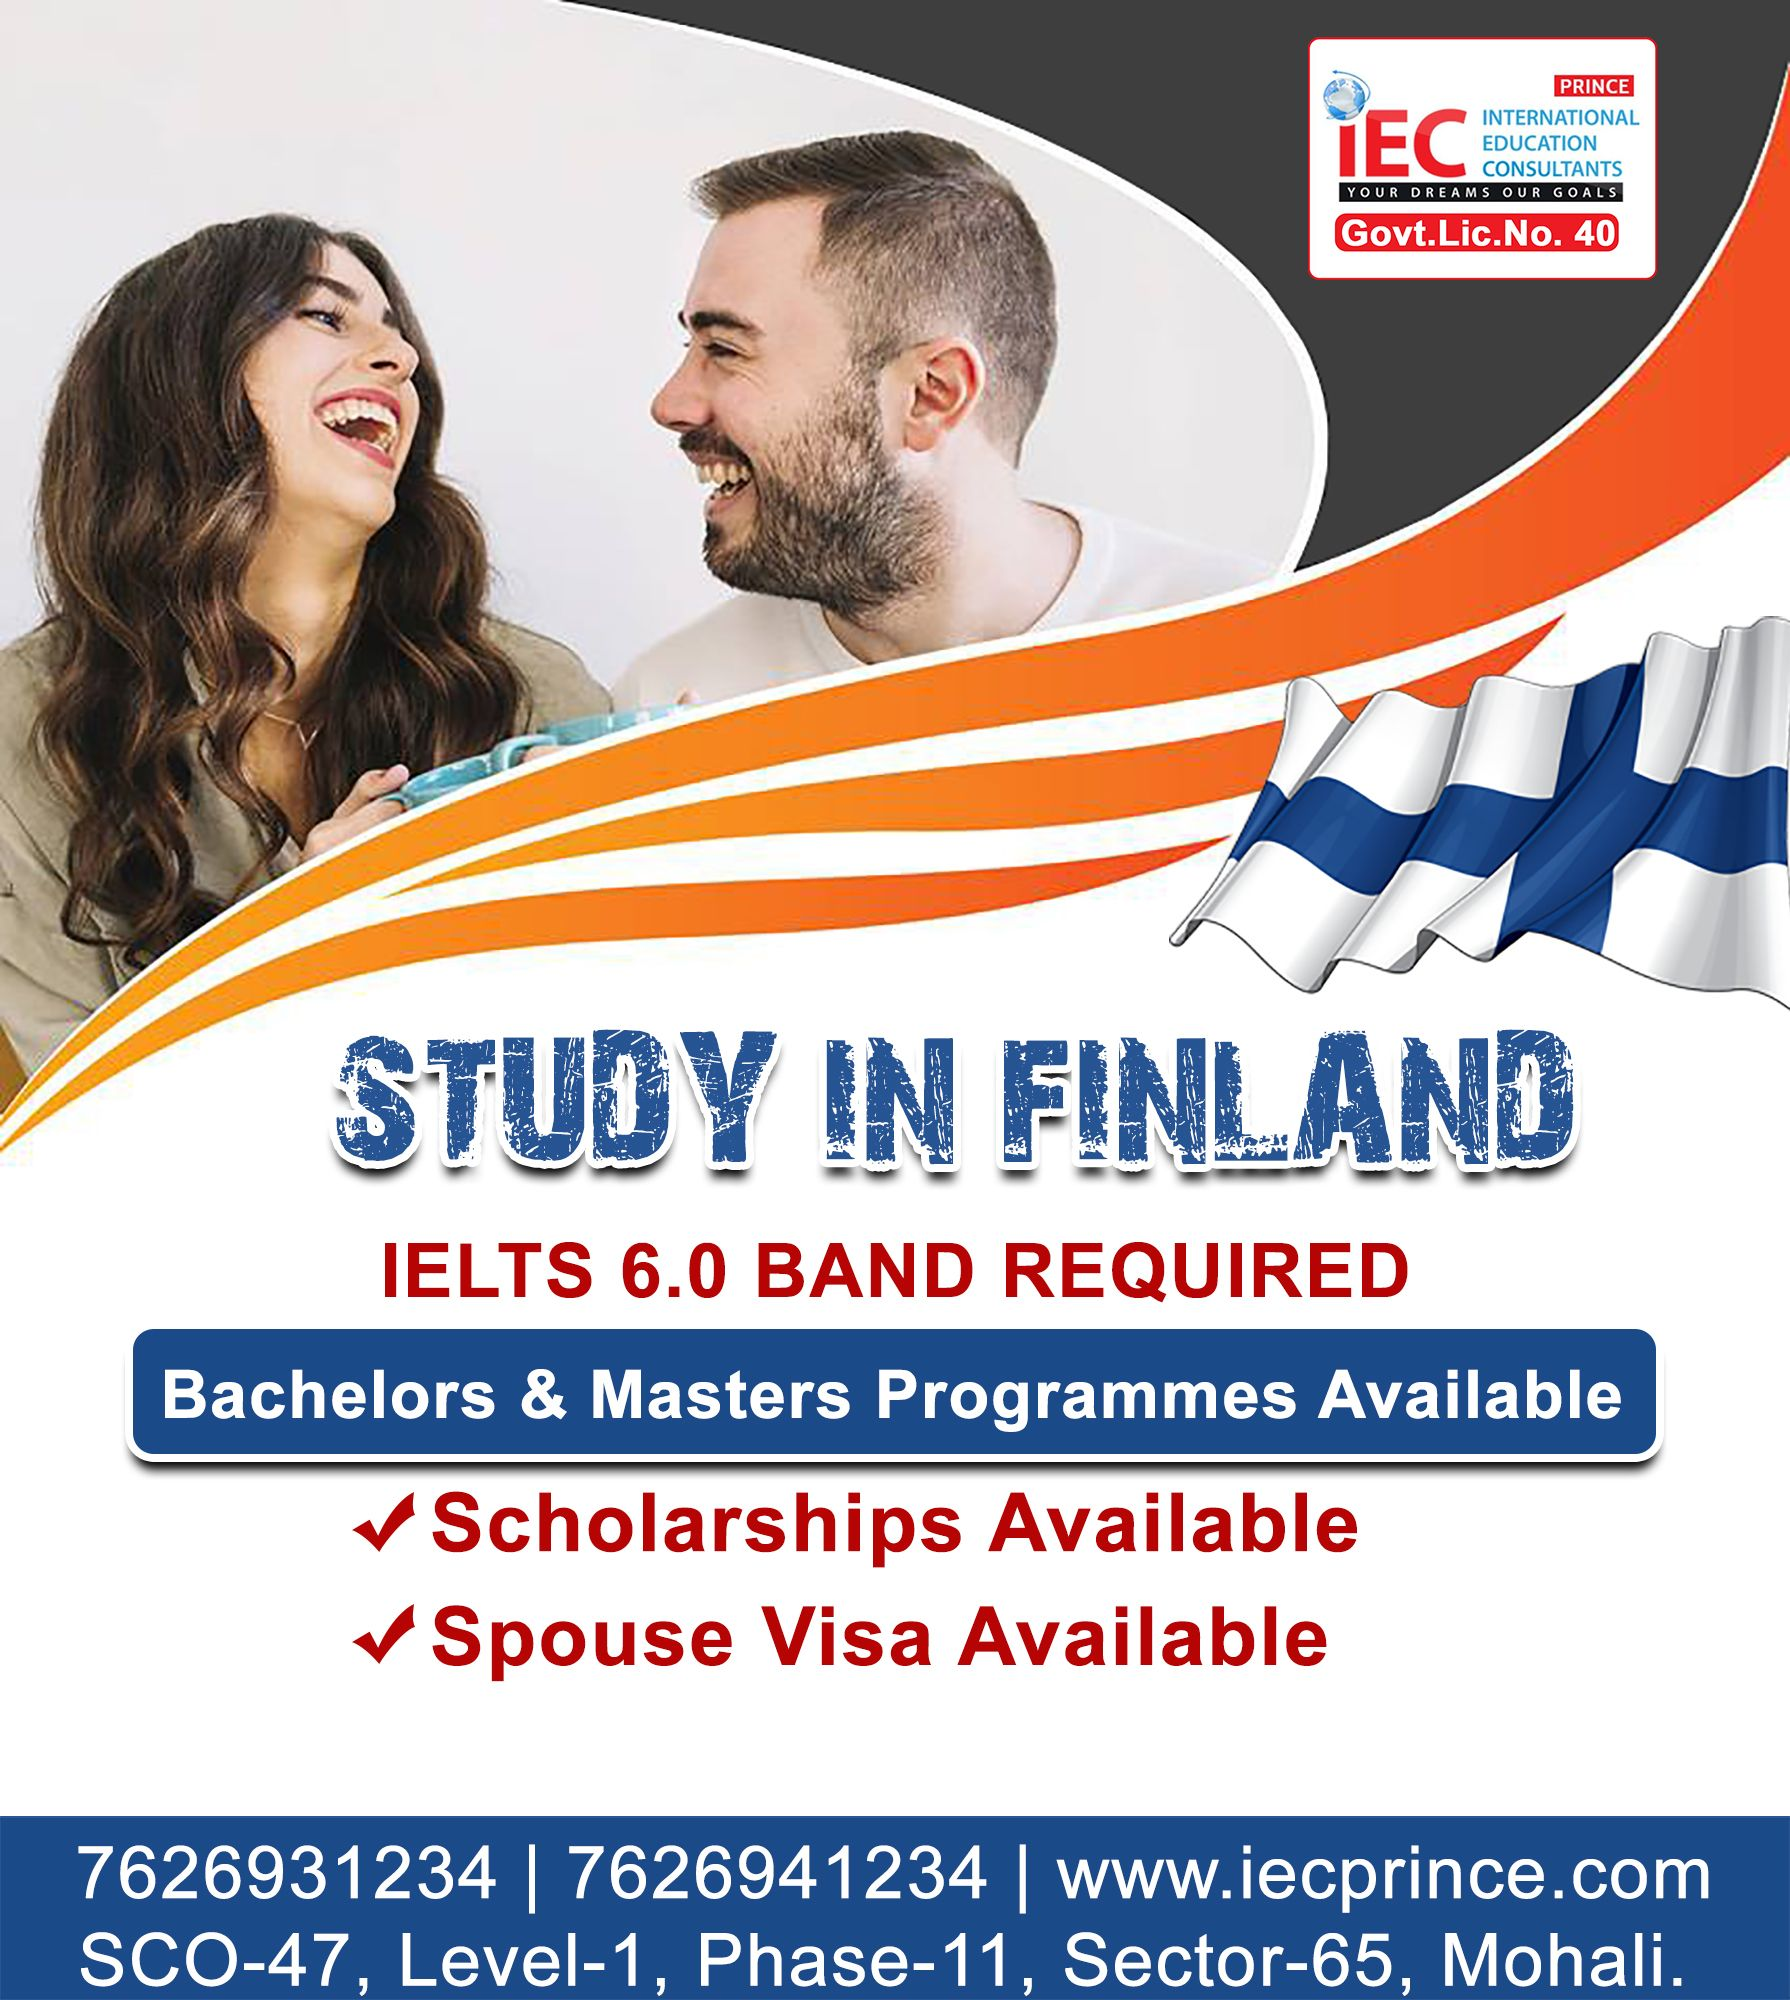 STUDY IN FINLAND 🇫🇮🇫🇮 🔹 World Class Education 🔹 Schengen